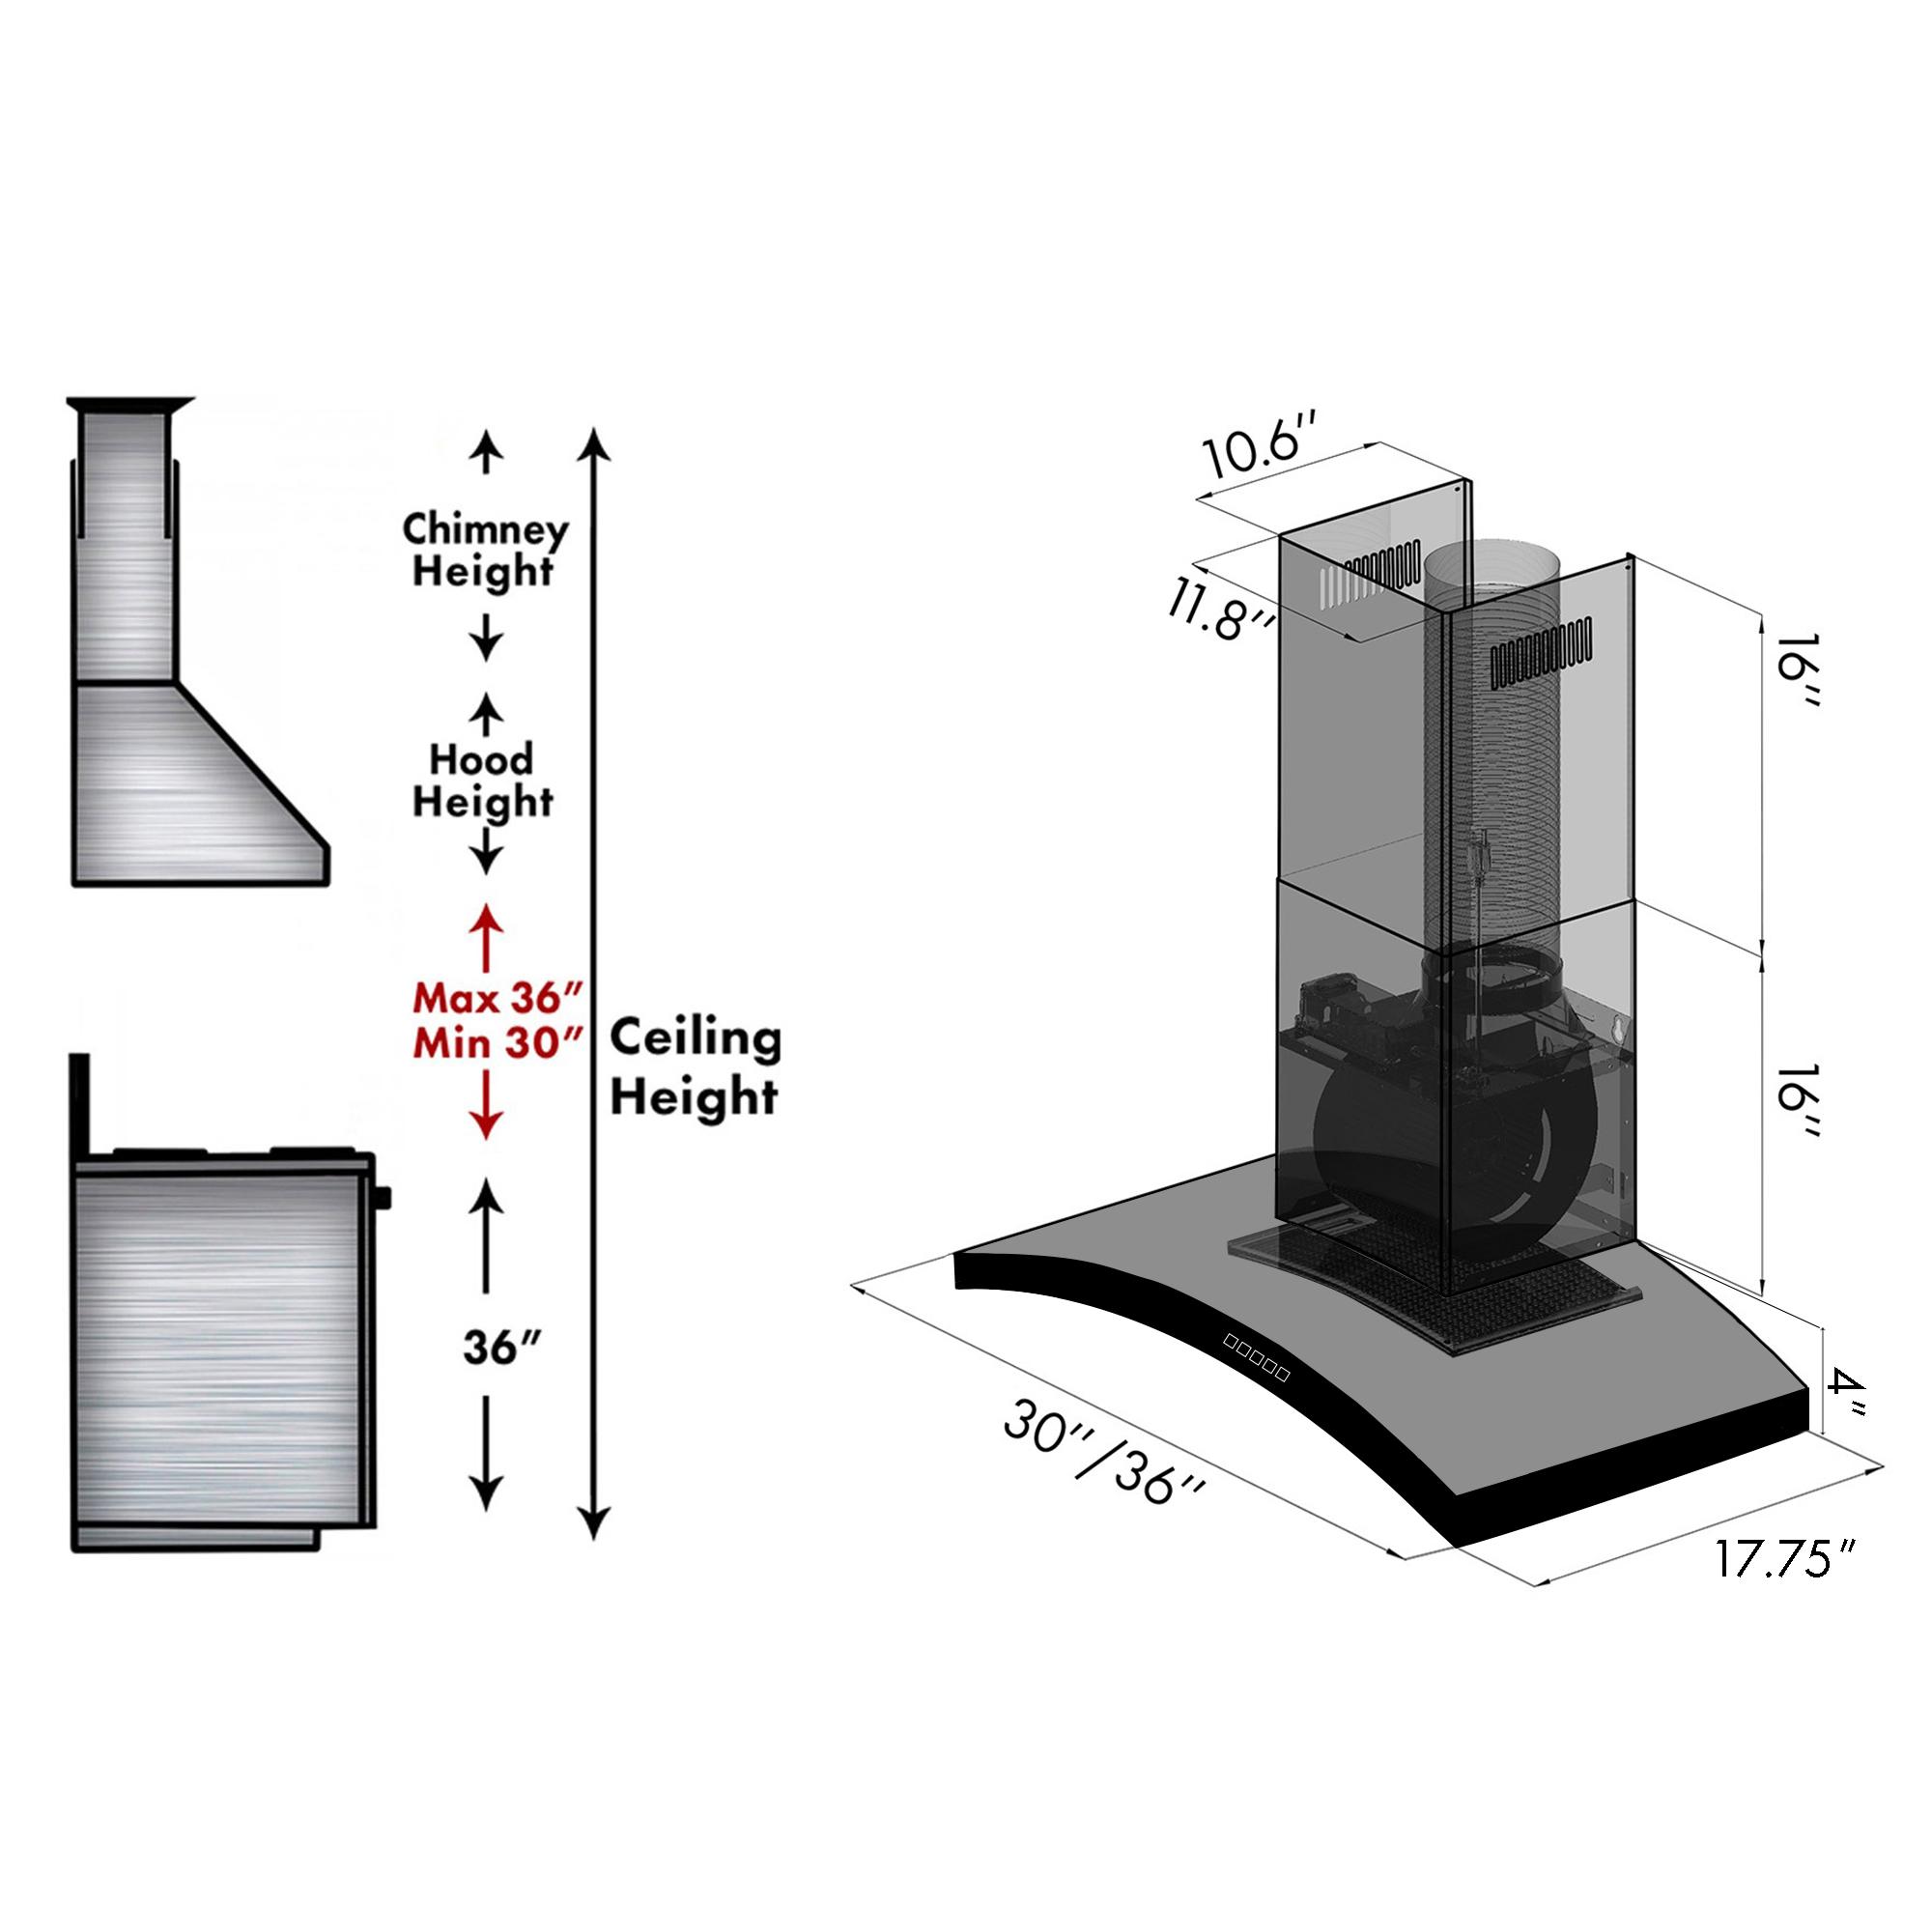 zline-stainless-steel-wall-mounted-range-hood-kn6-graphic-new_1.jpg